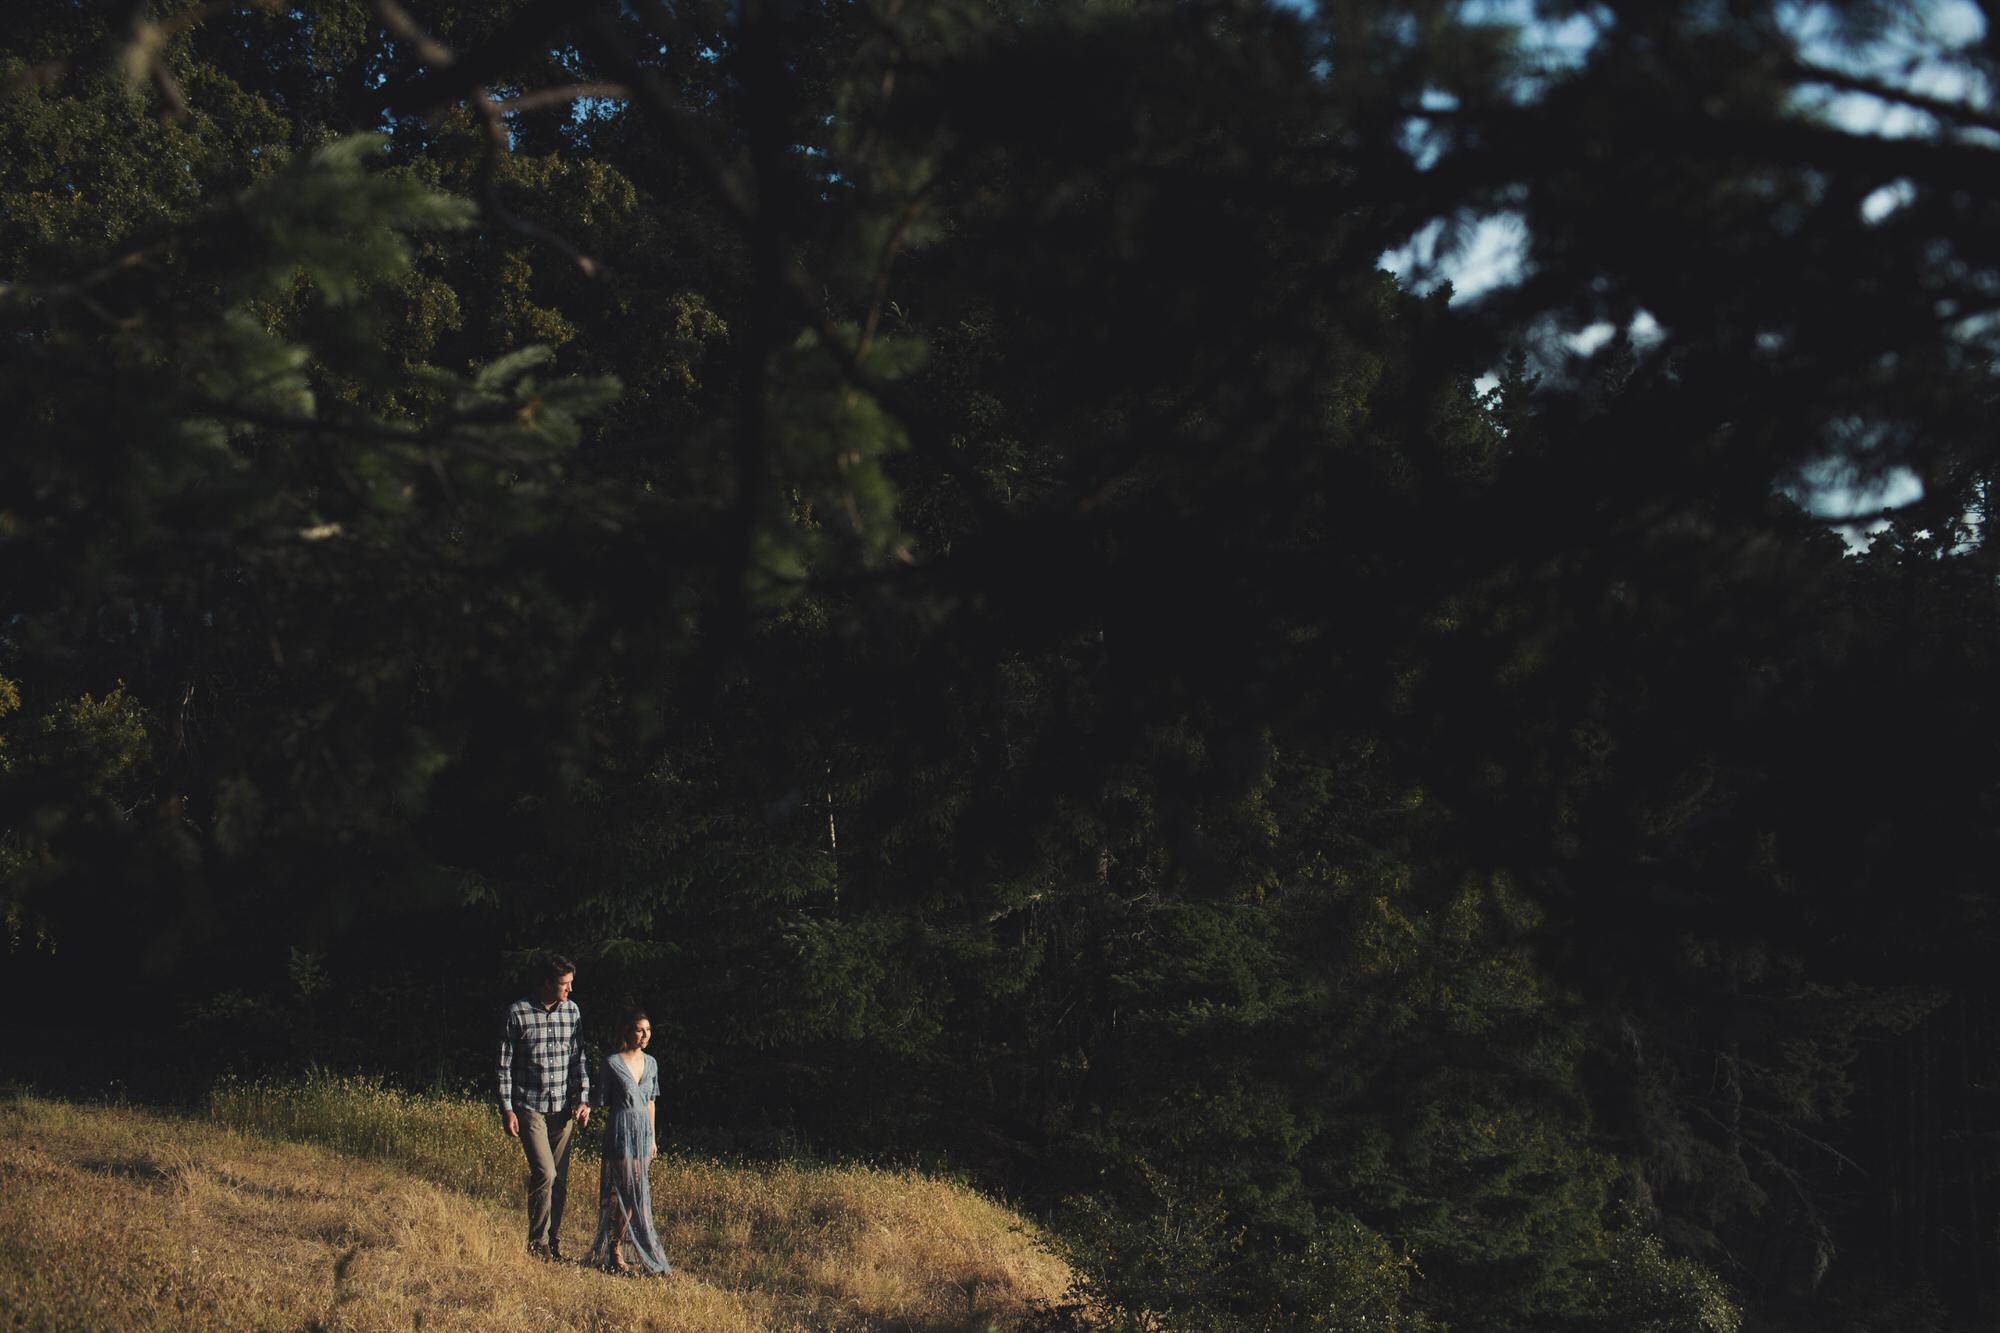 Forrest Engagement Photos